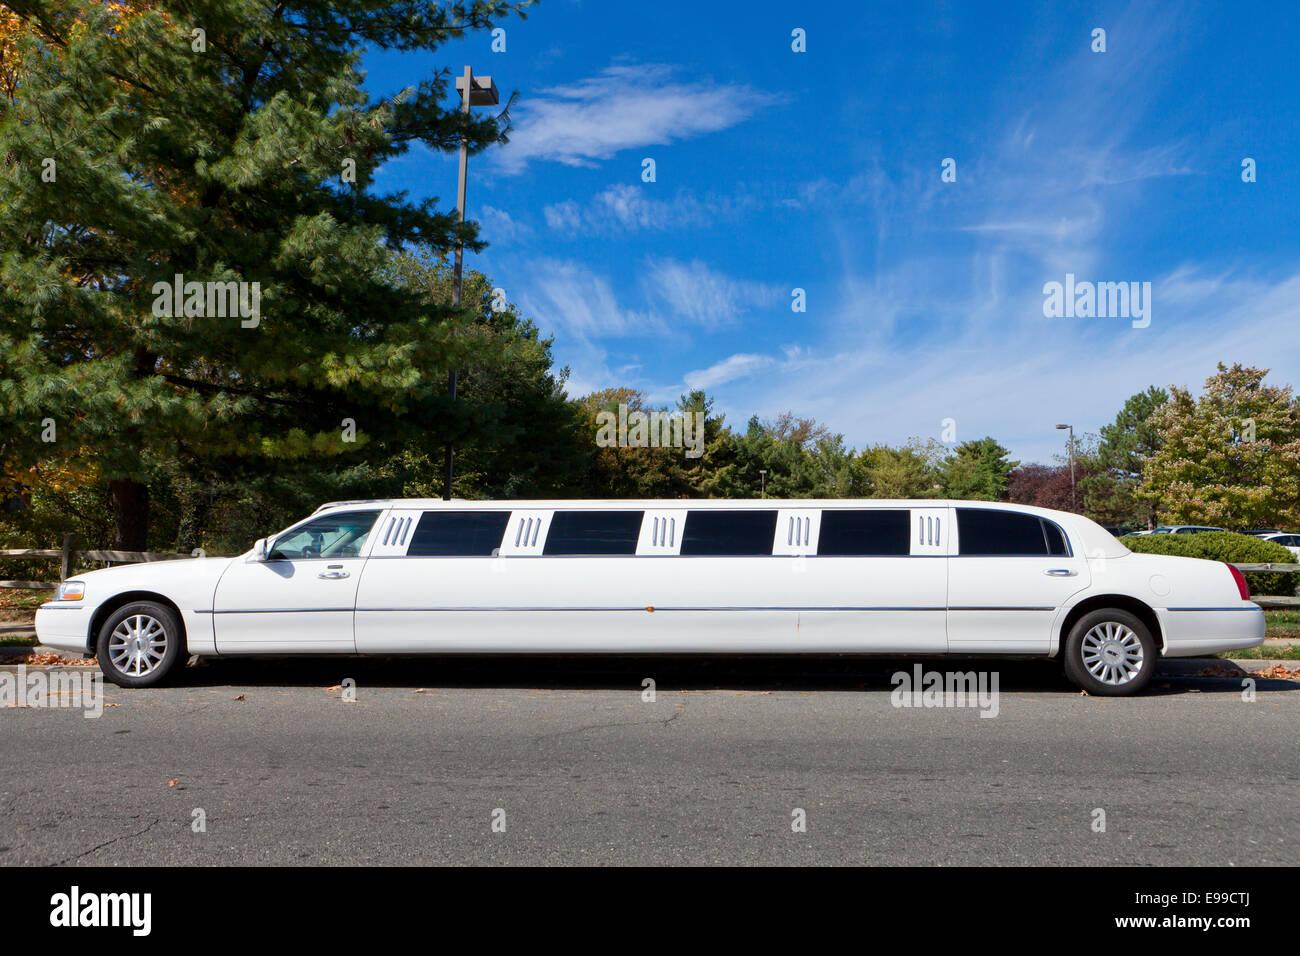 White limousine parked - USA - Stock Image